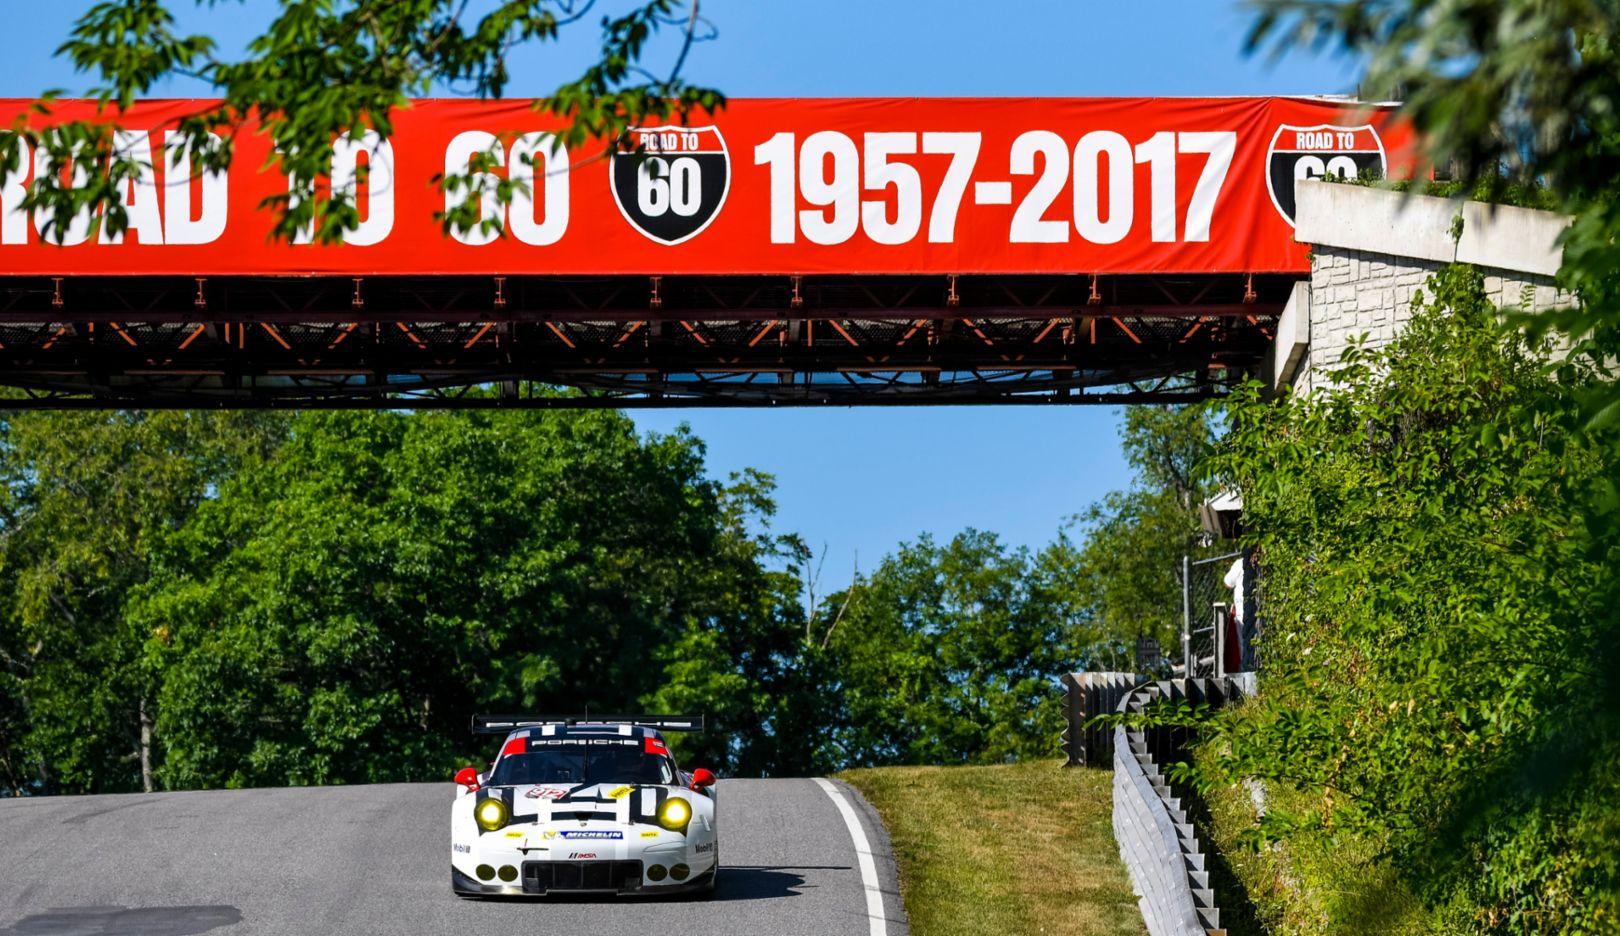 911 RSR, Lime Rock Park, IMSA WeatherTech SportsCar Championship, 2016, Porsche AG